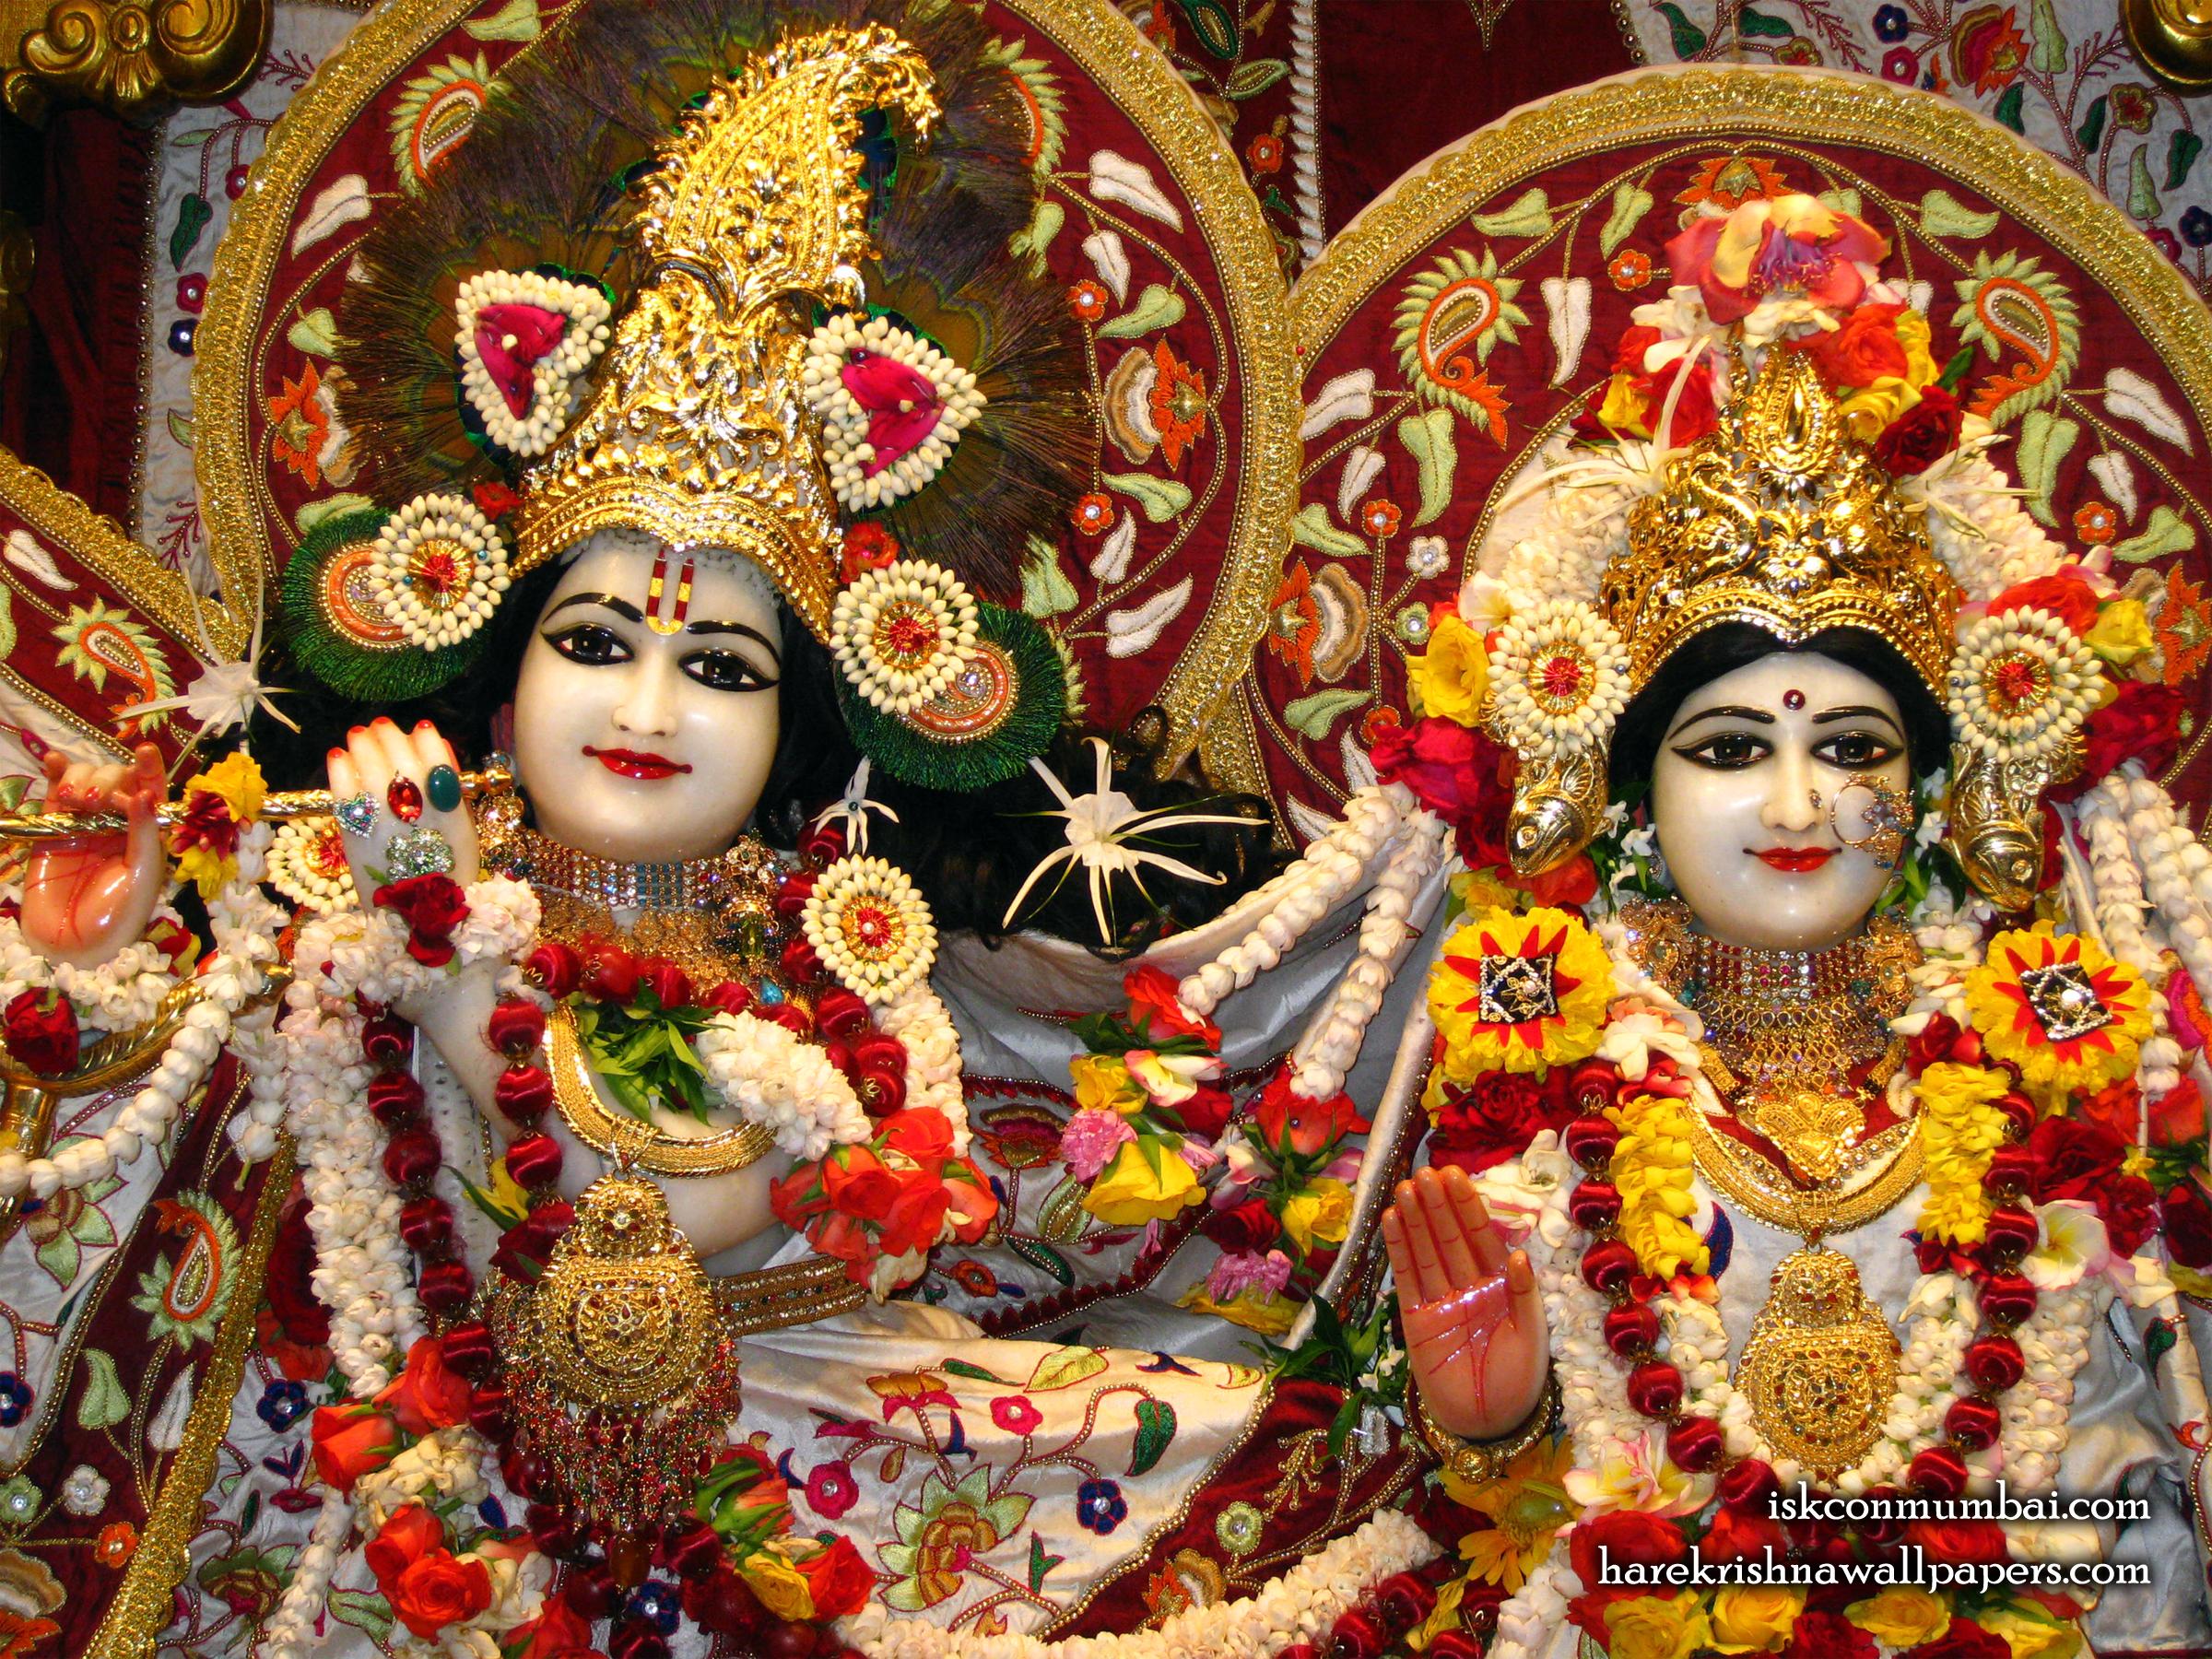 Sri Sri Radha Rasabihari Close up Wallpaper (004) Size 2400x1800 Download